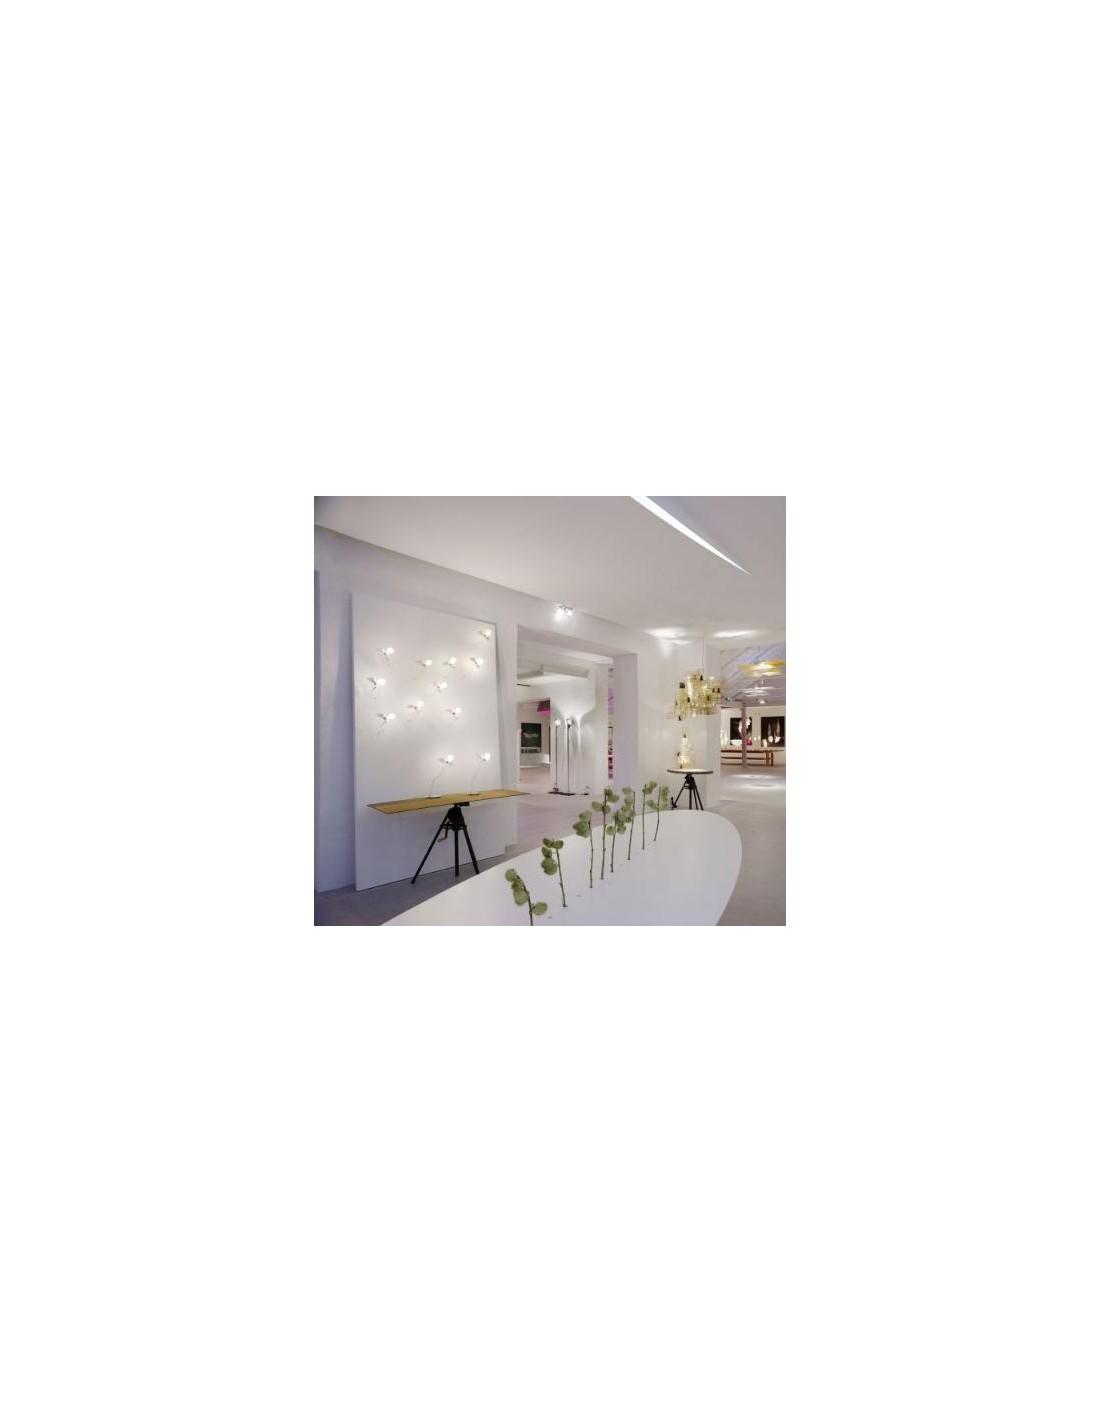 applique lucellino nt. Black Bedroom Furniture Sets. Home Design Ideas